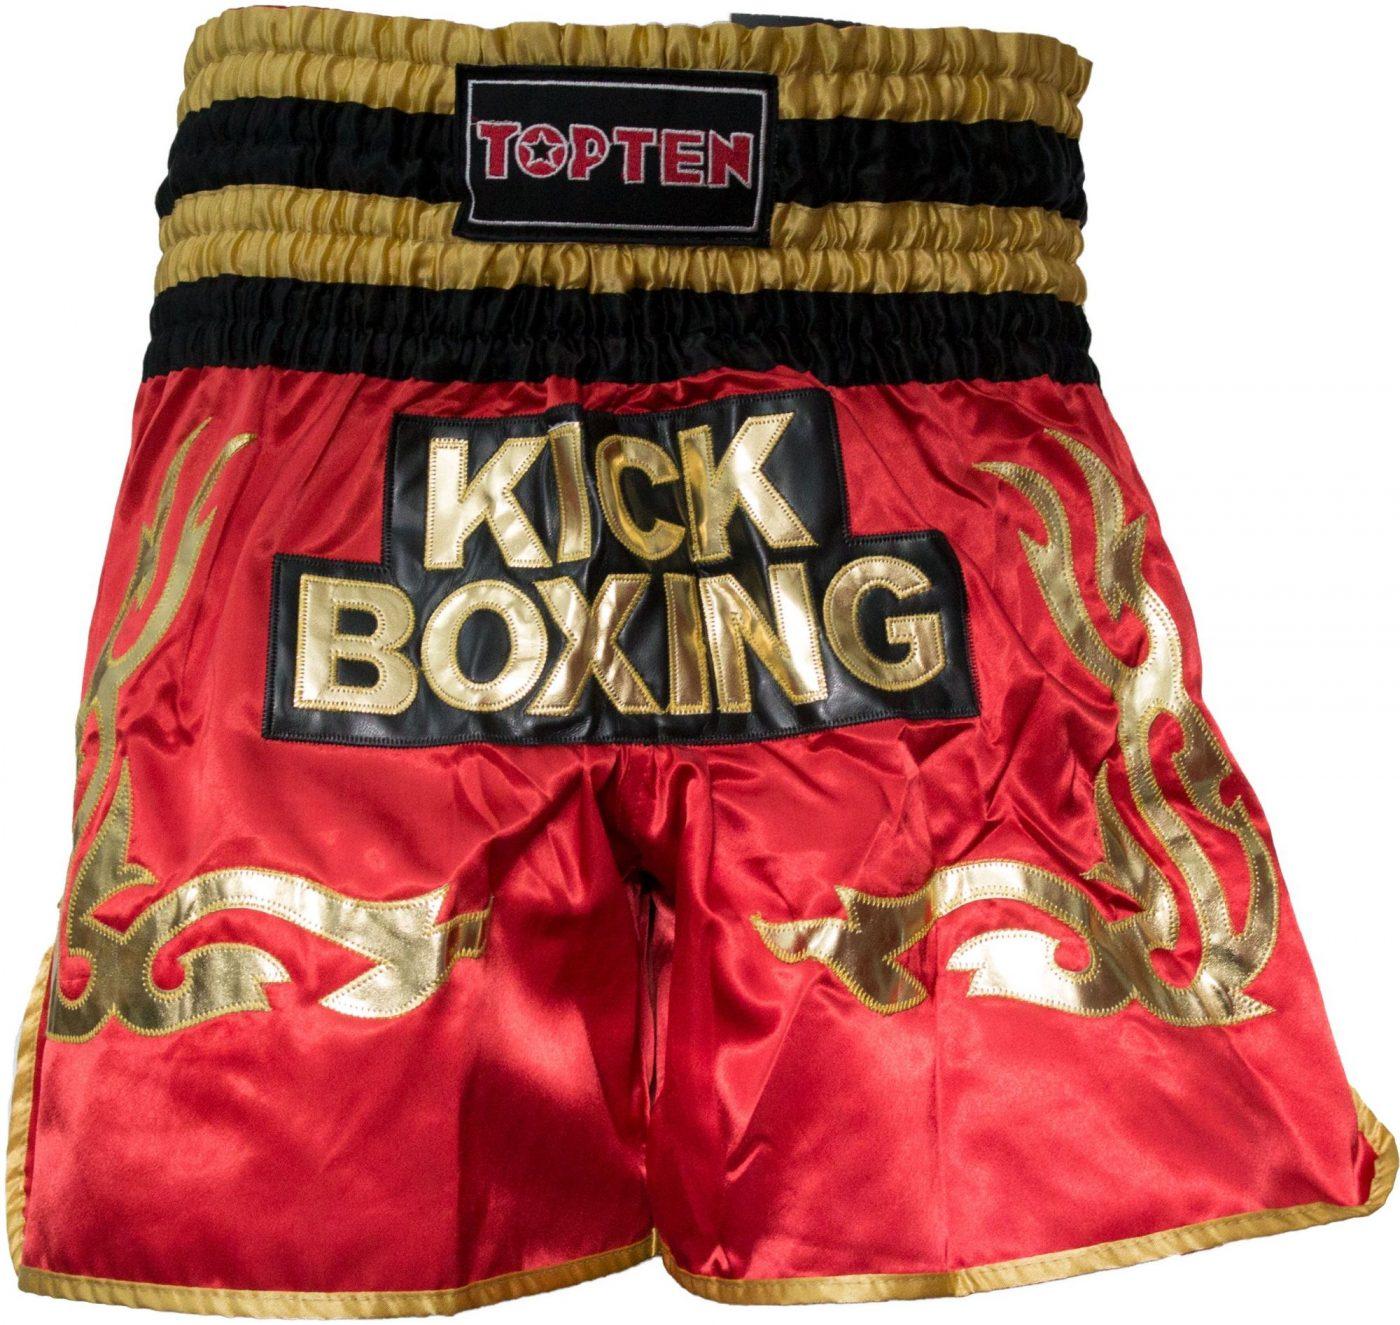 "Kickboksbroekje ""WAKO Kickboxing"" Rood"